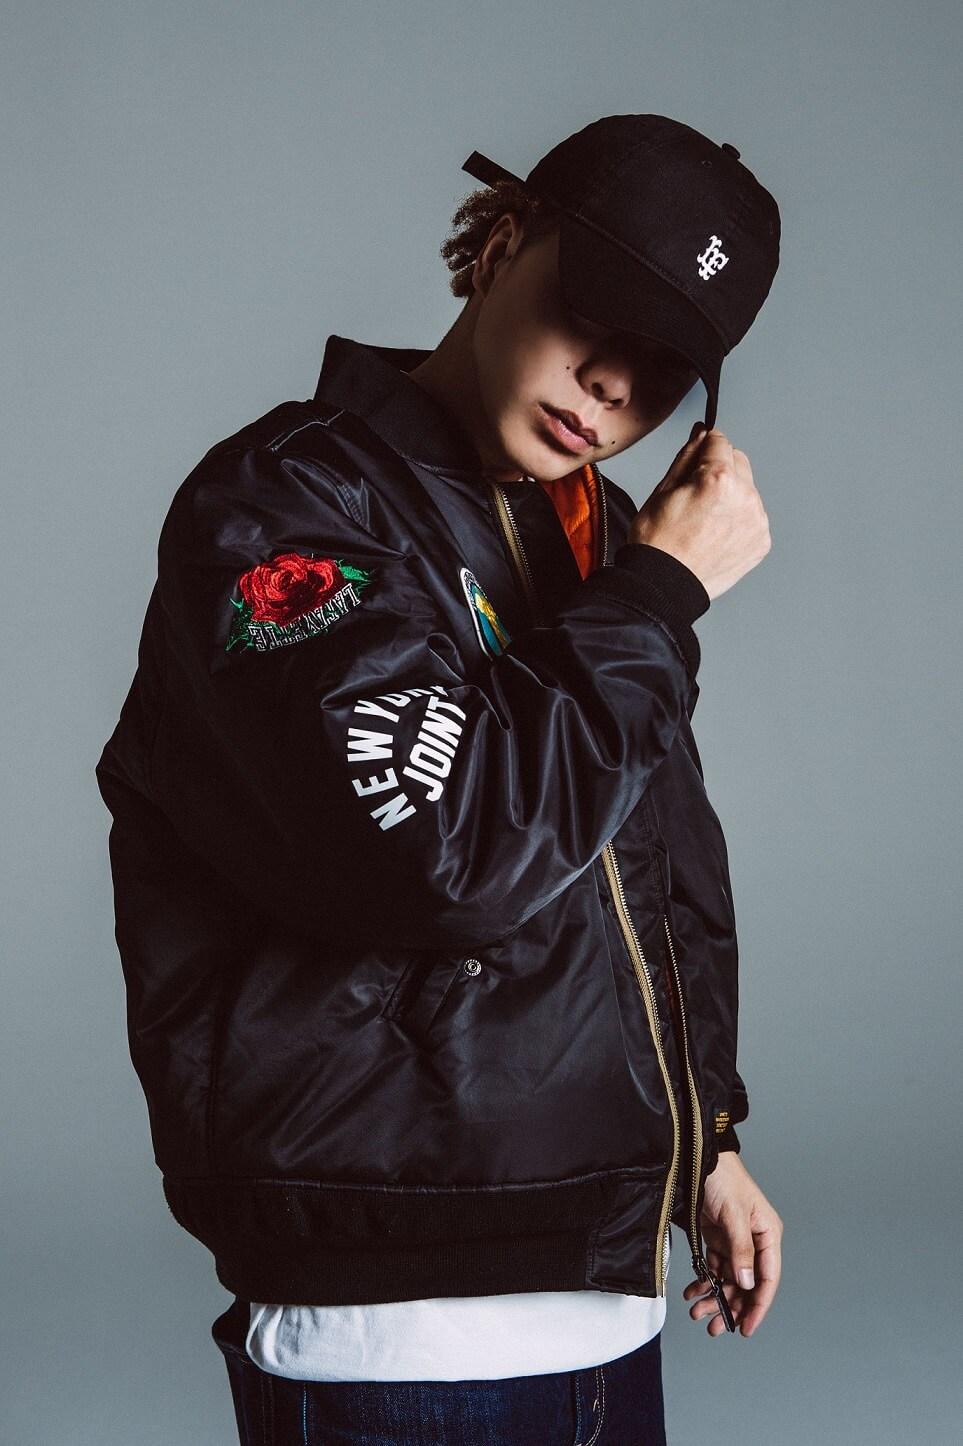 GADORO、本日発売アルバム『SUIGARA』より「I'm sorry」Music Video公開サムネイル画像